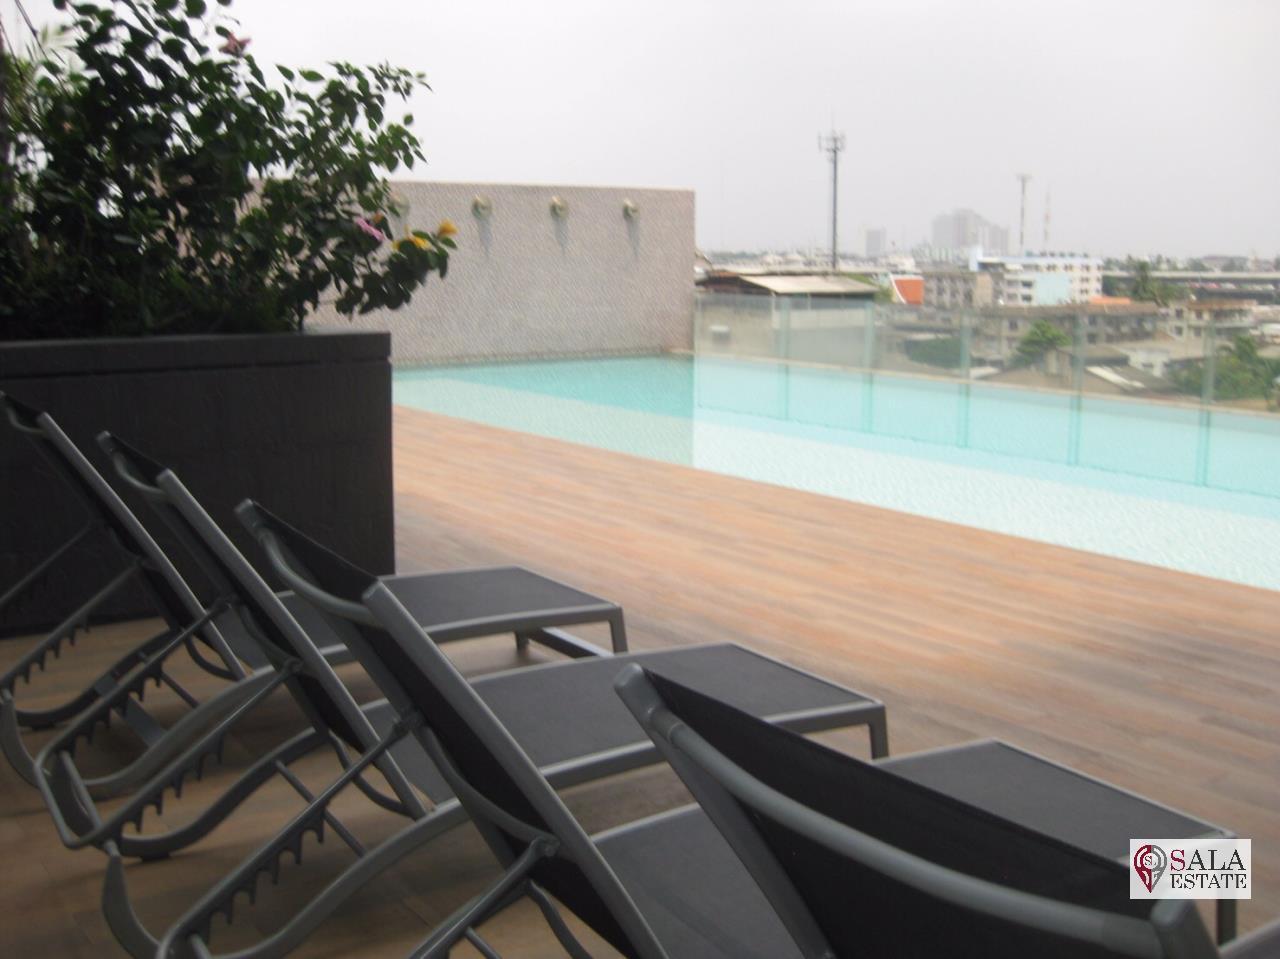 SALA ESTATE Agency's THE PARKLAND RATCHADA - THAPRA, 2 Bedroom 1 Bathroom, Fully furnished 8